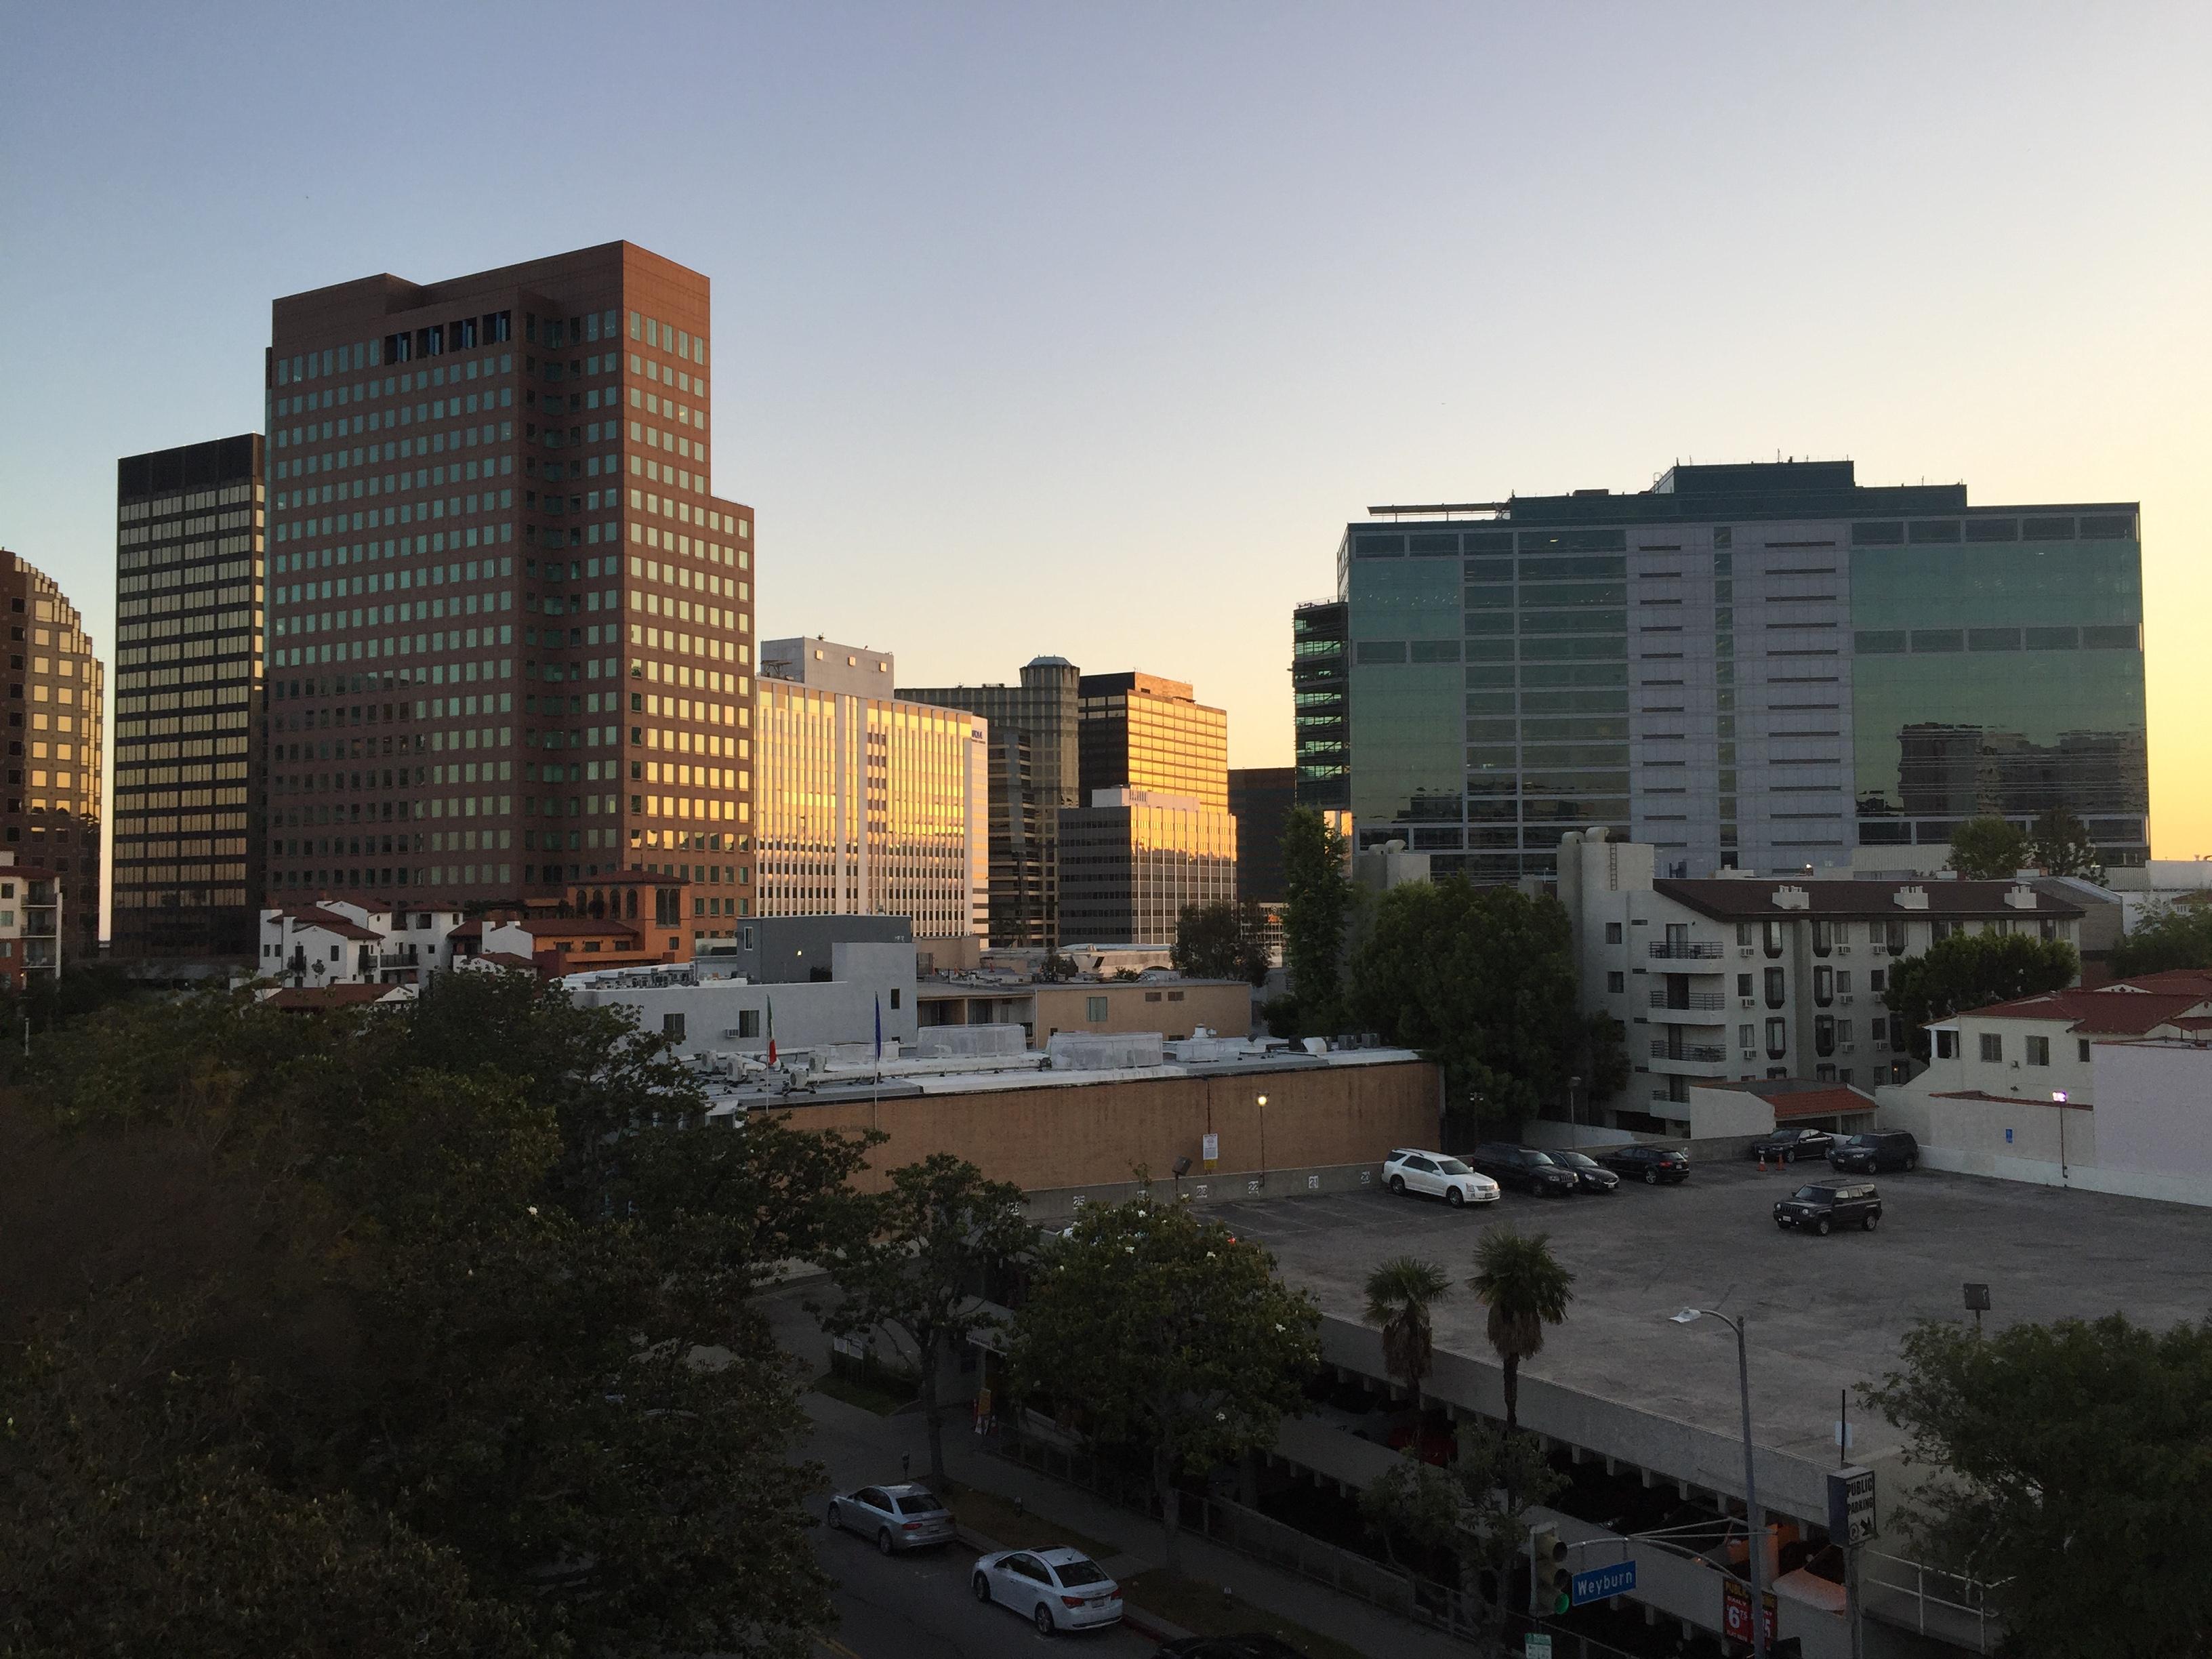 Westwood, Los Angeles wiki, Westwood, Los Angeles history, Westwood, Los Angeles news